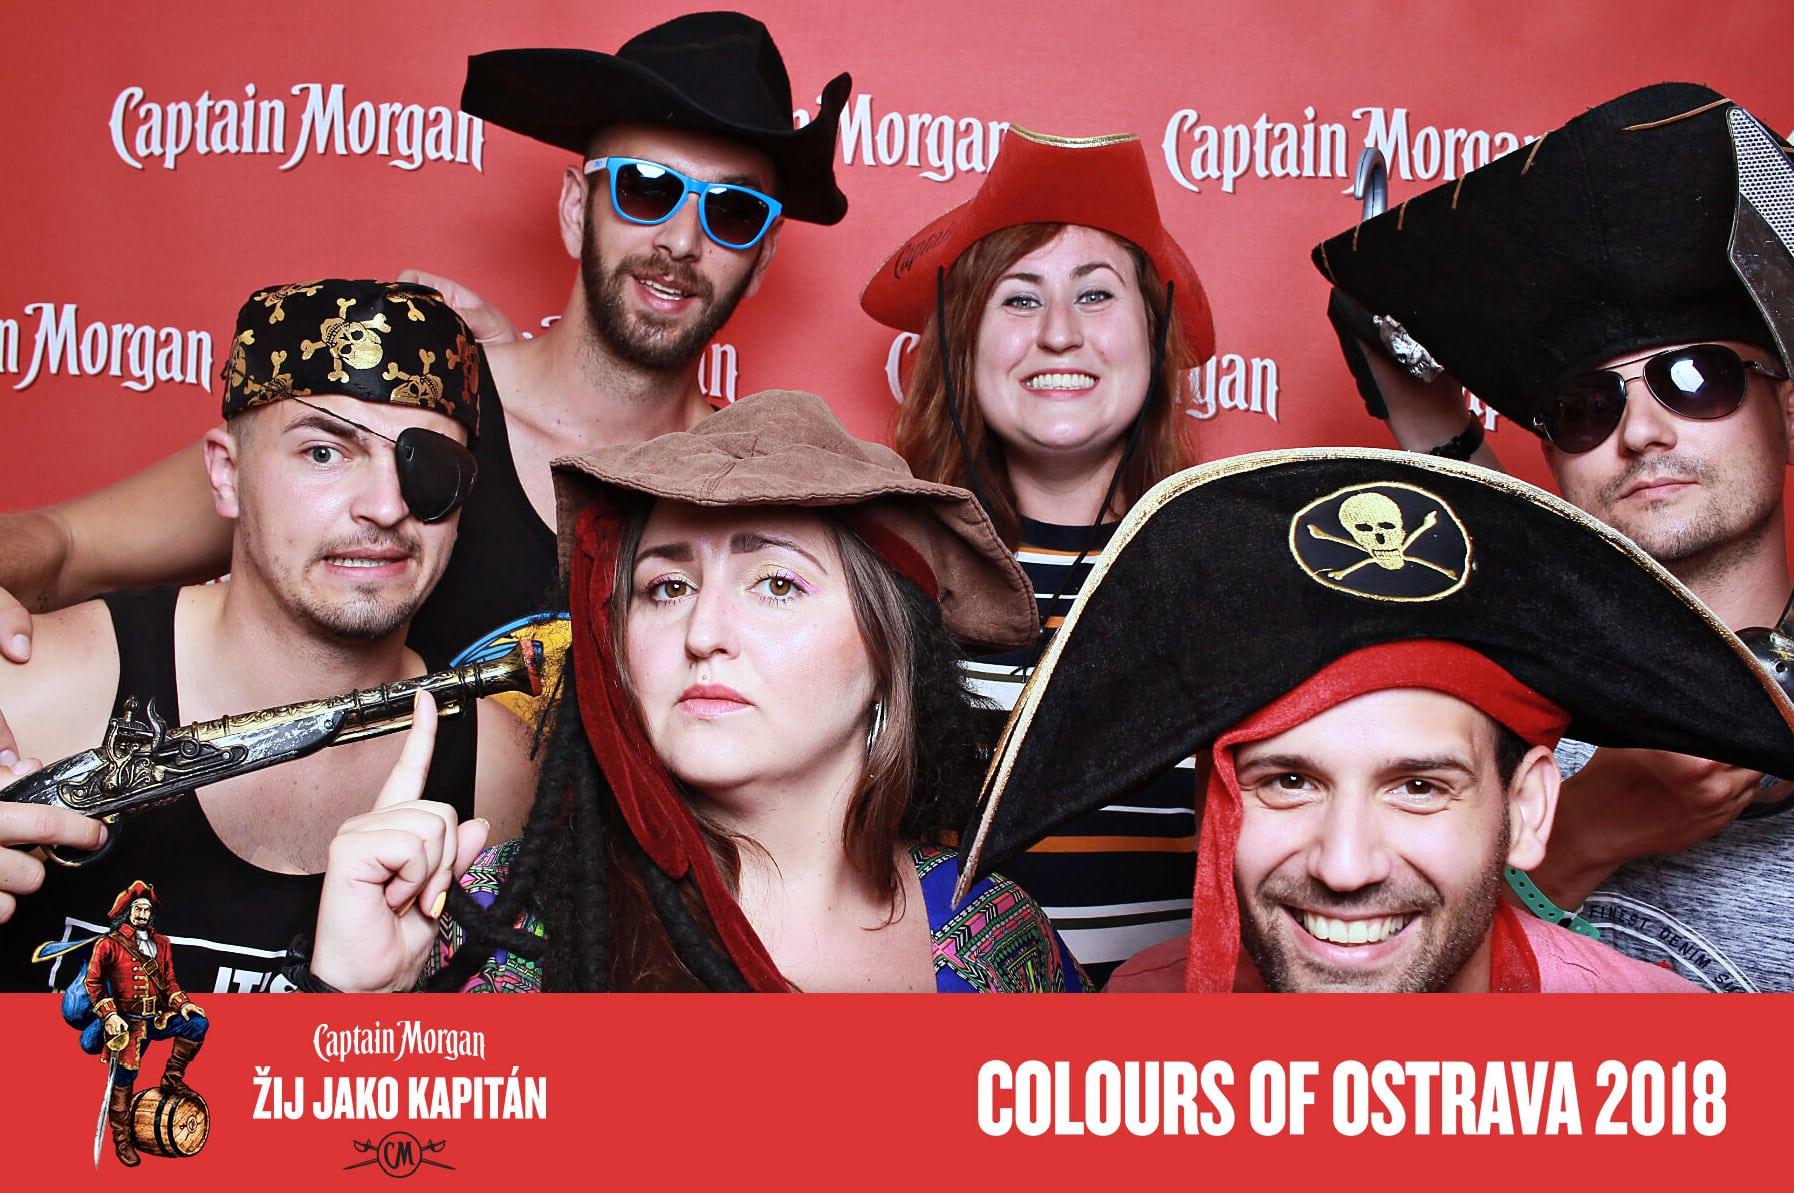 fotokoutek-captain-morgan-21-7-2018-464695